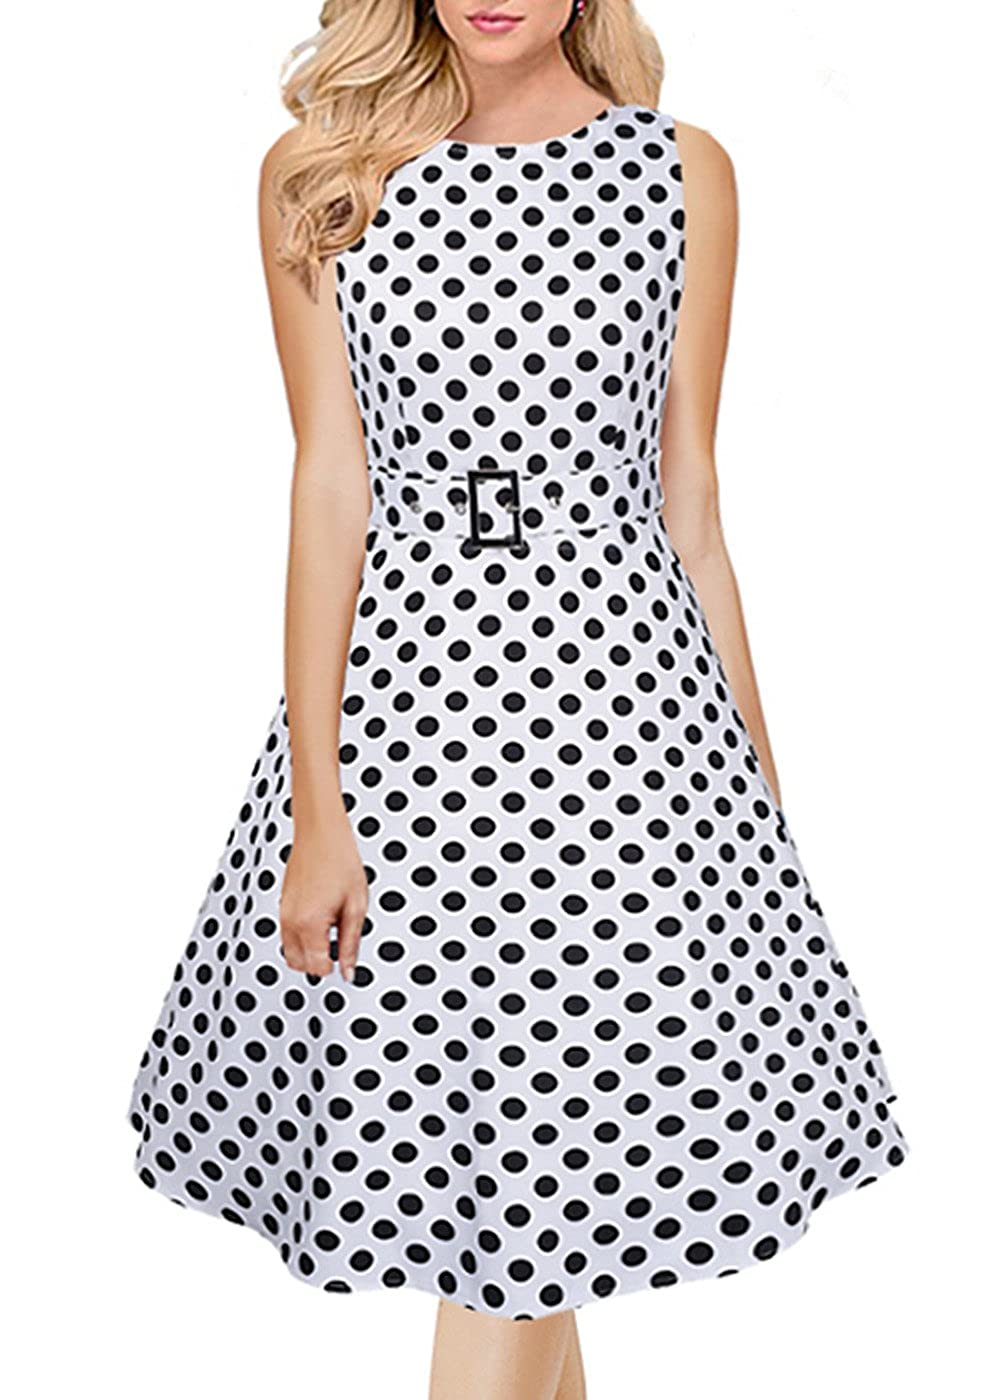 5c416d0b4dc04 Women Vintage 1950s Spring Garden Party Dress for Women Sleeveless ...